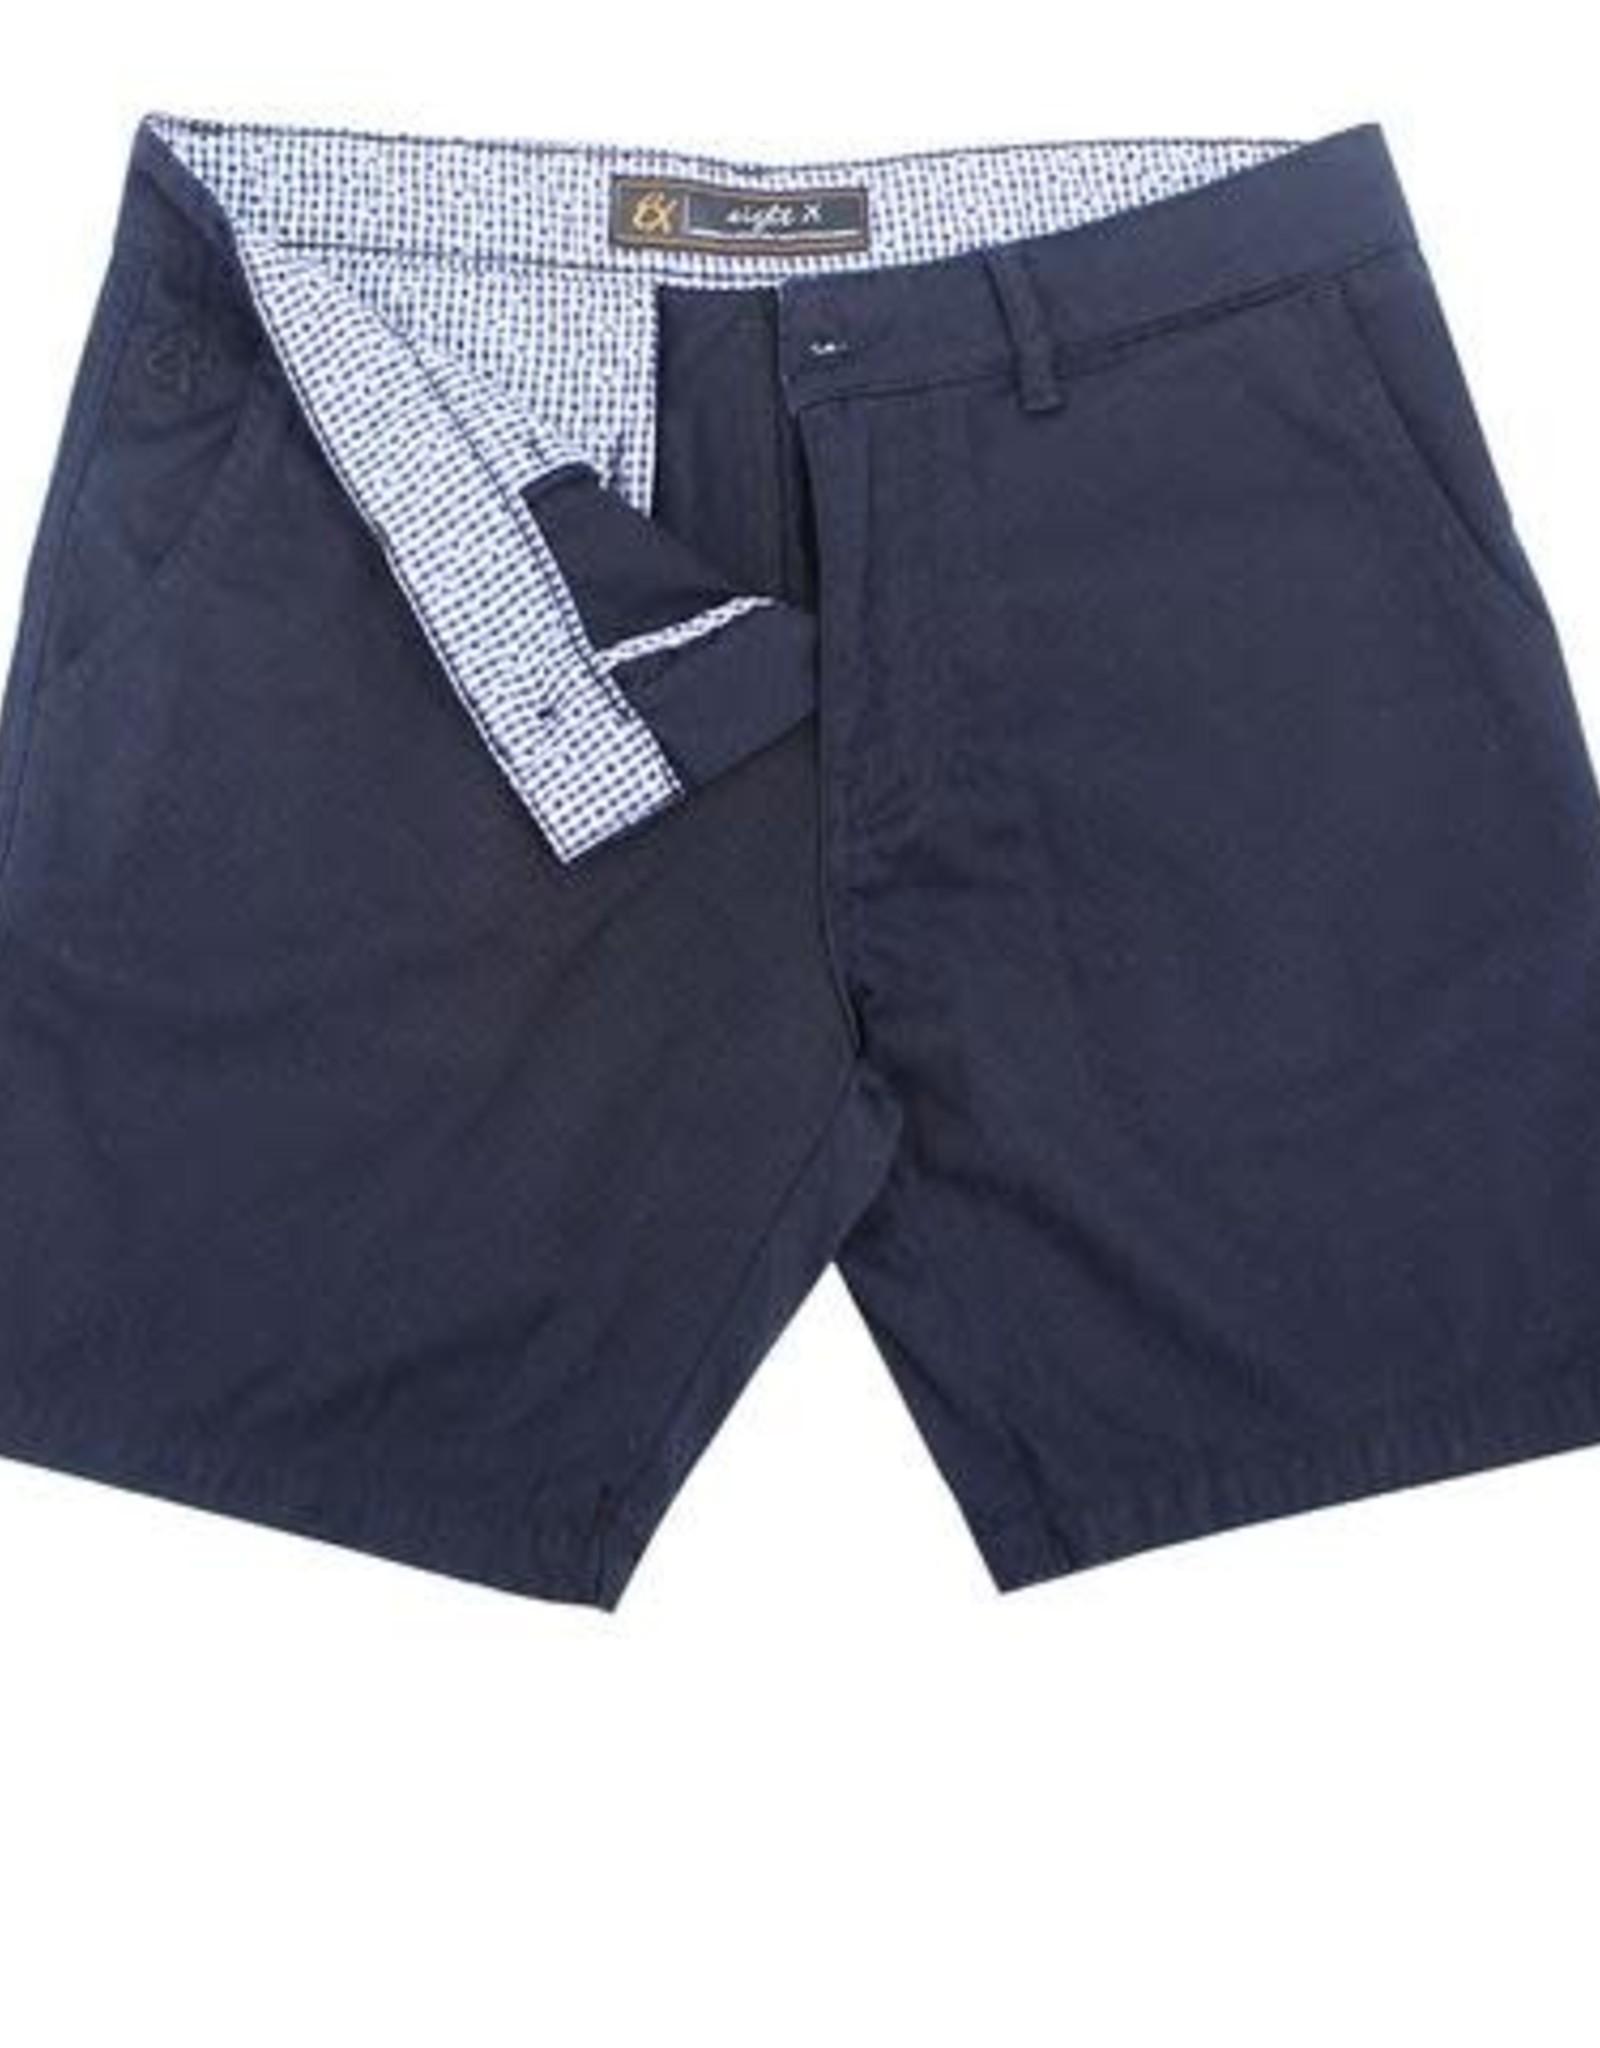 Eight X Slim Fit Textured Short